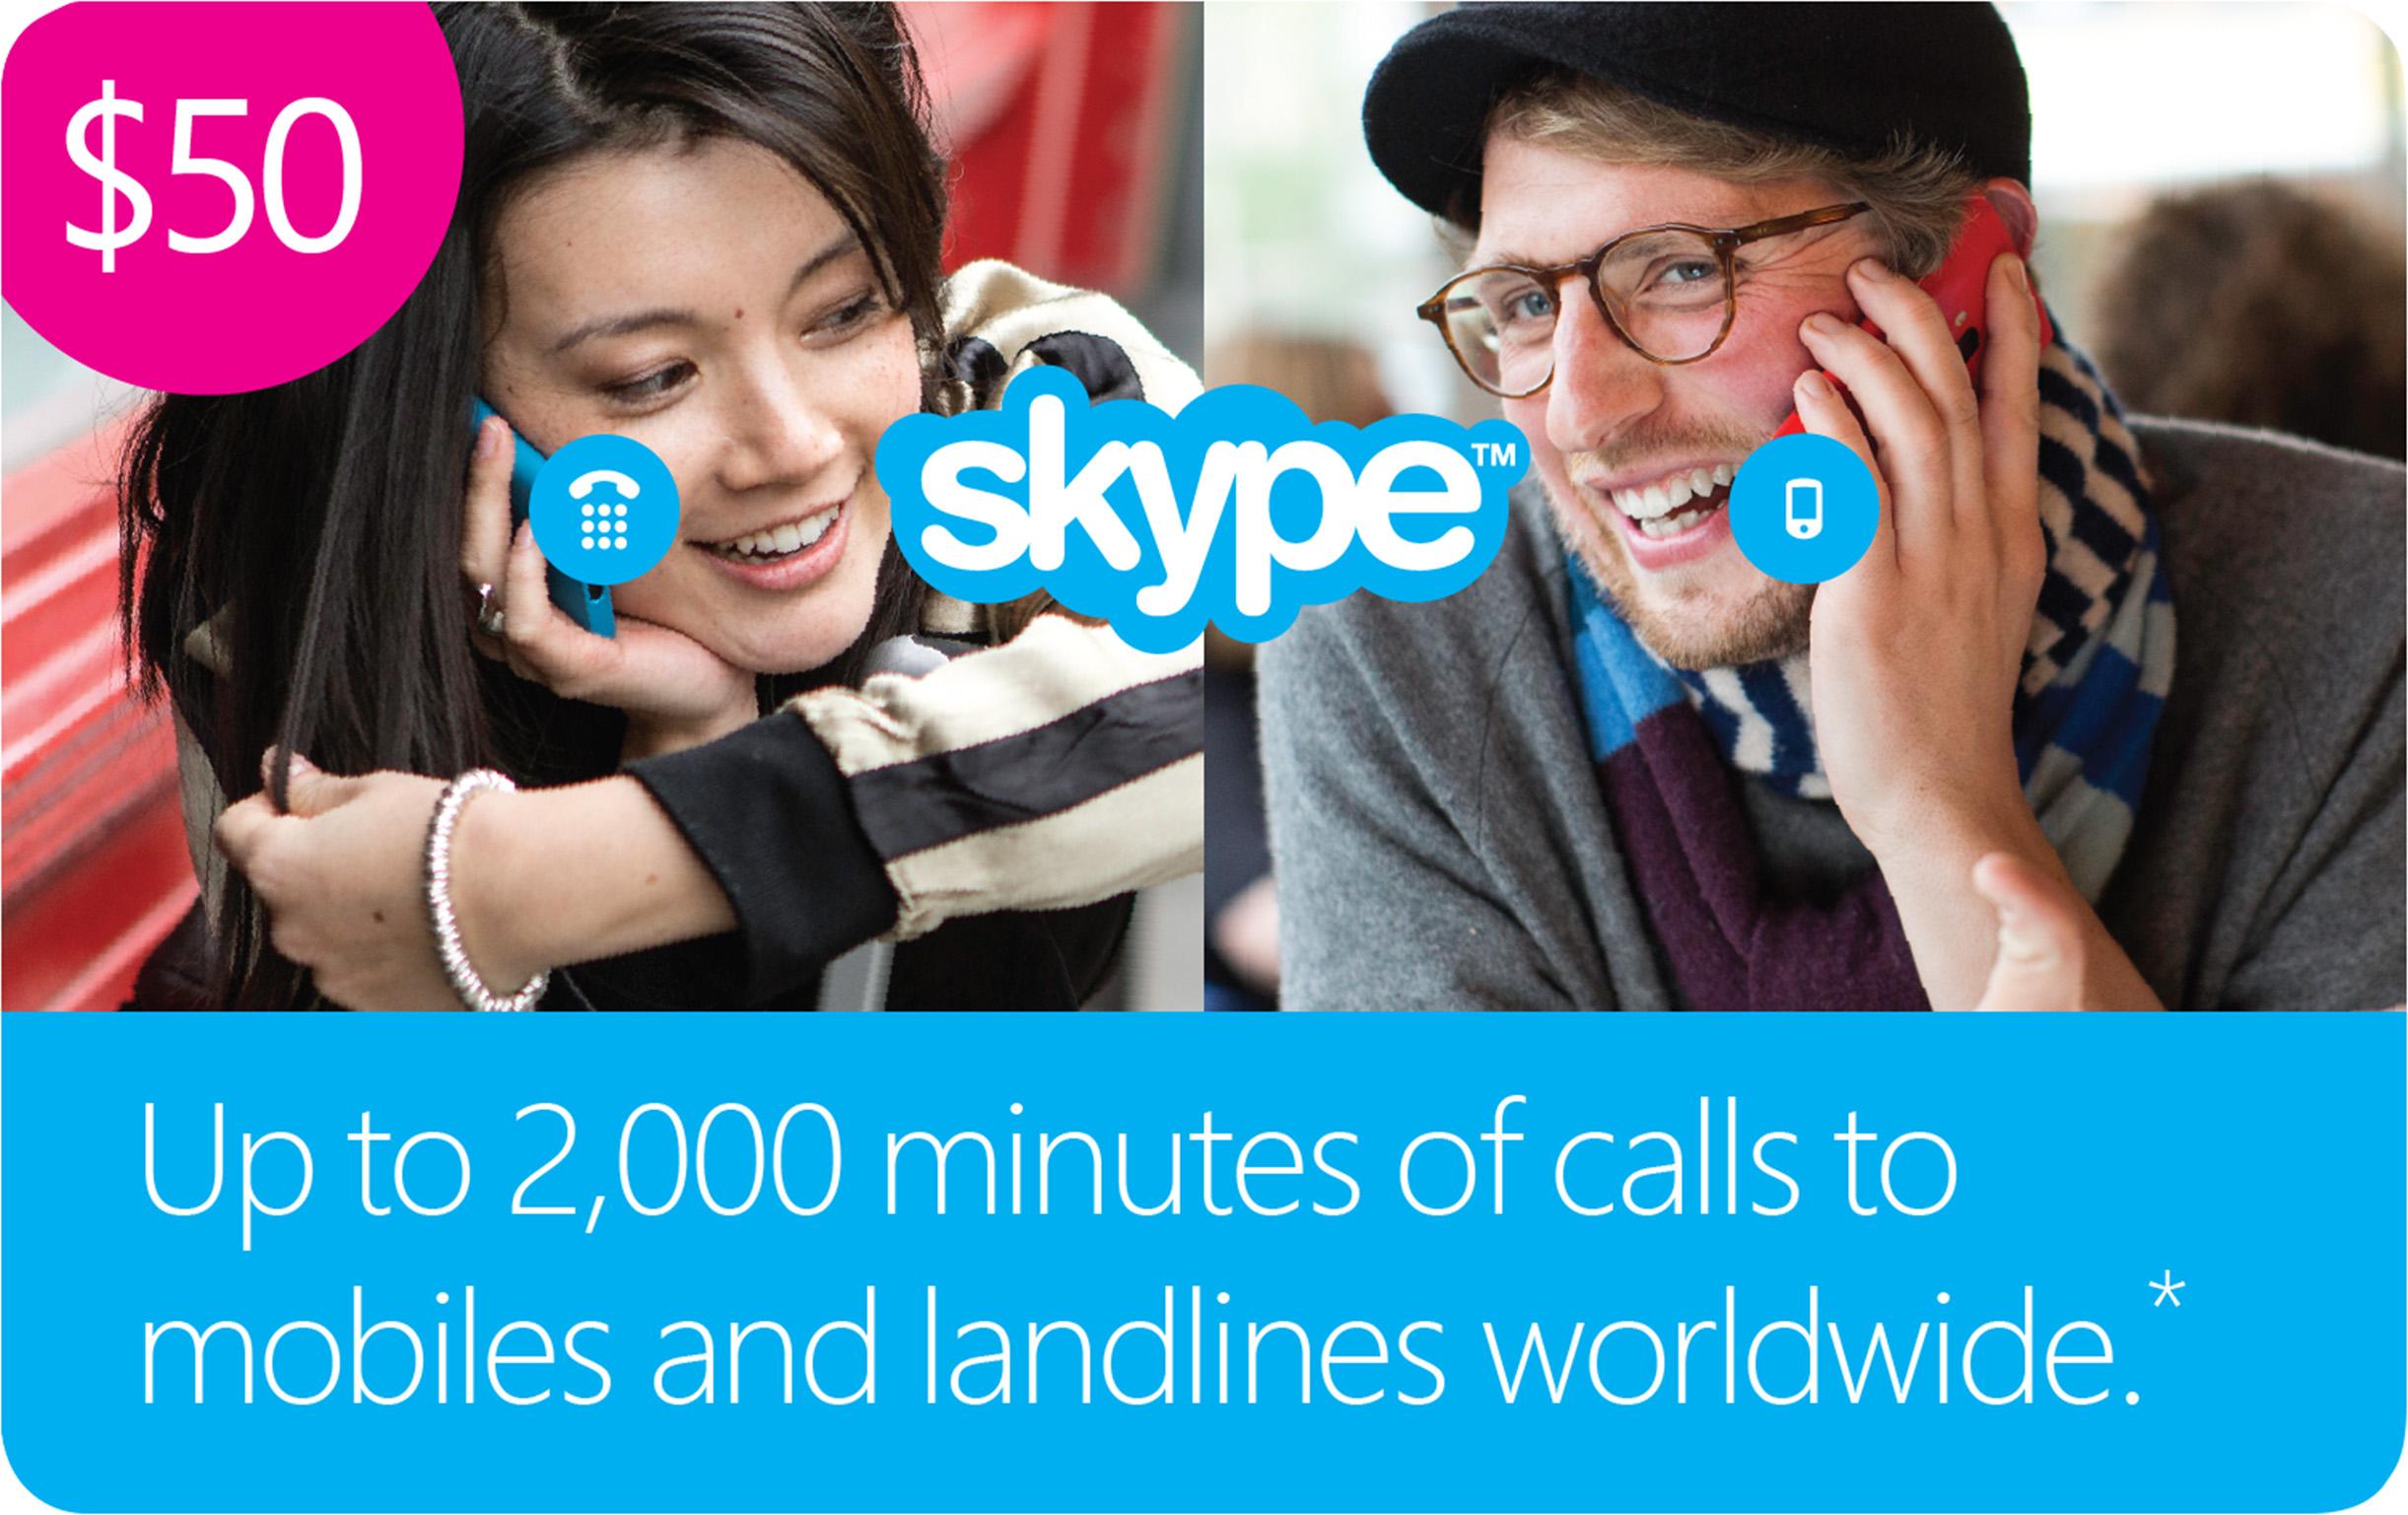 RW6de3?ver=d51e - Skype Credit